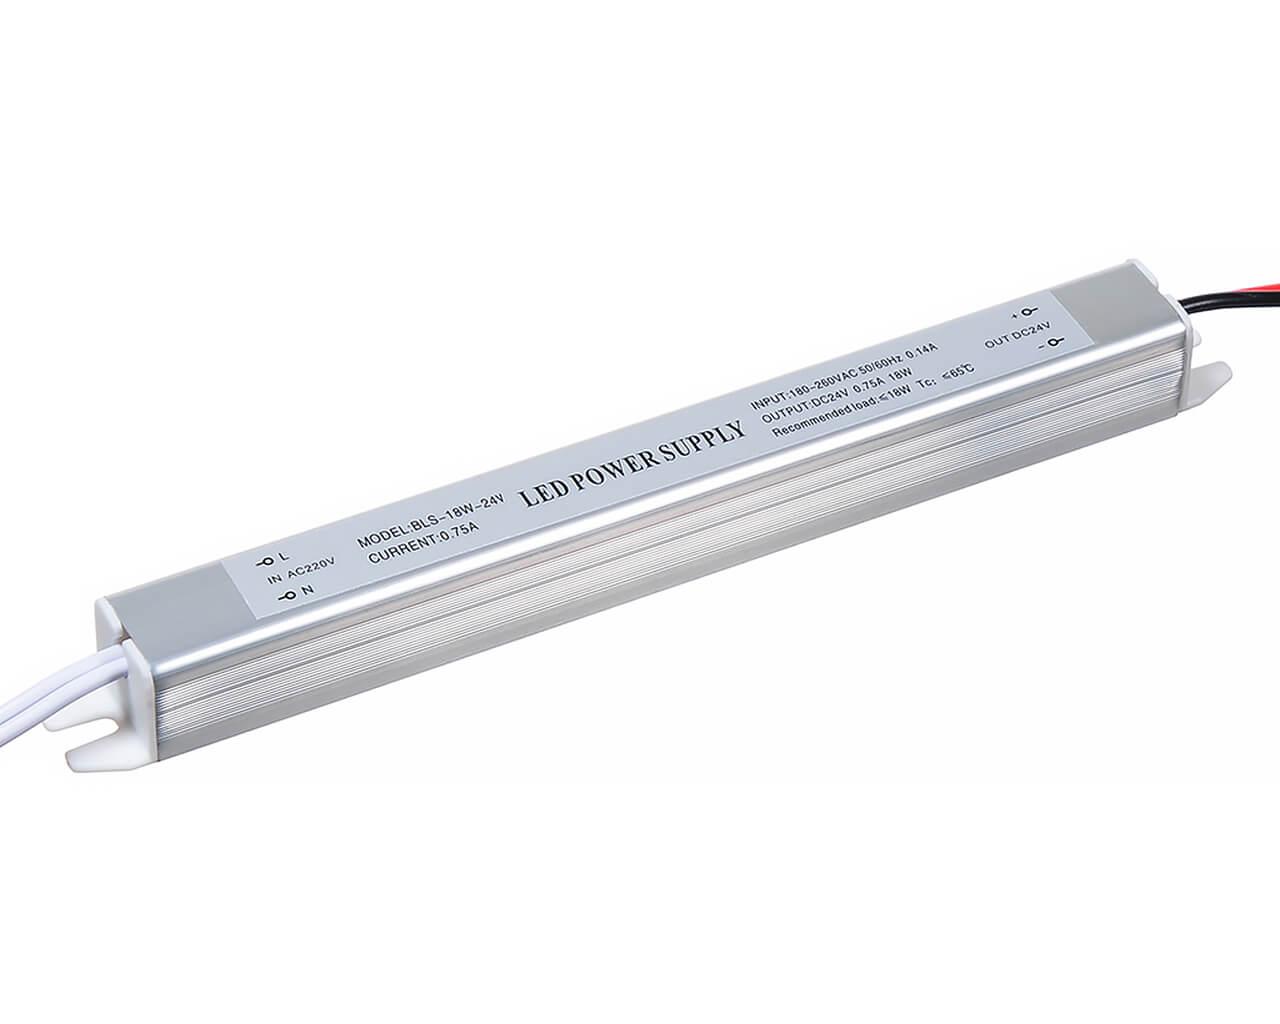 Блок питания LC-K18W-24V 0,75 А (карандаш 172*18*18)